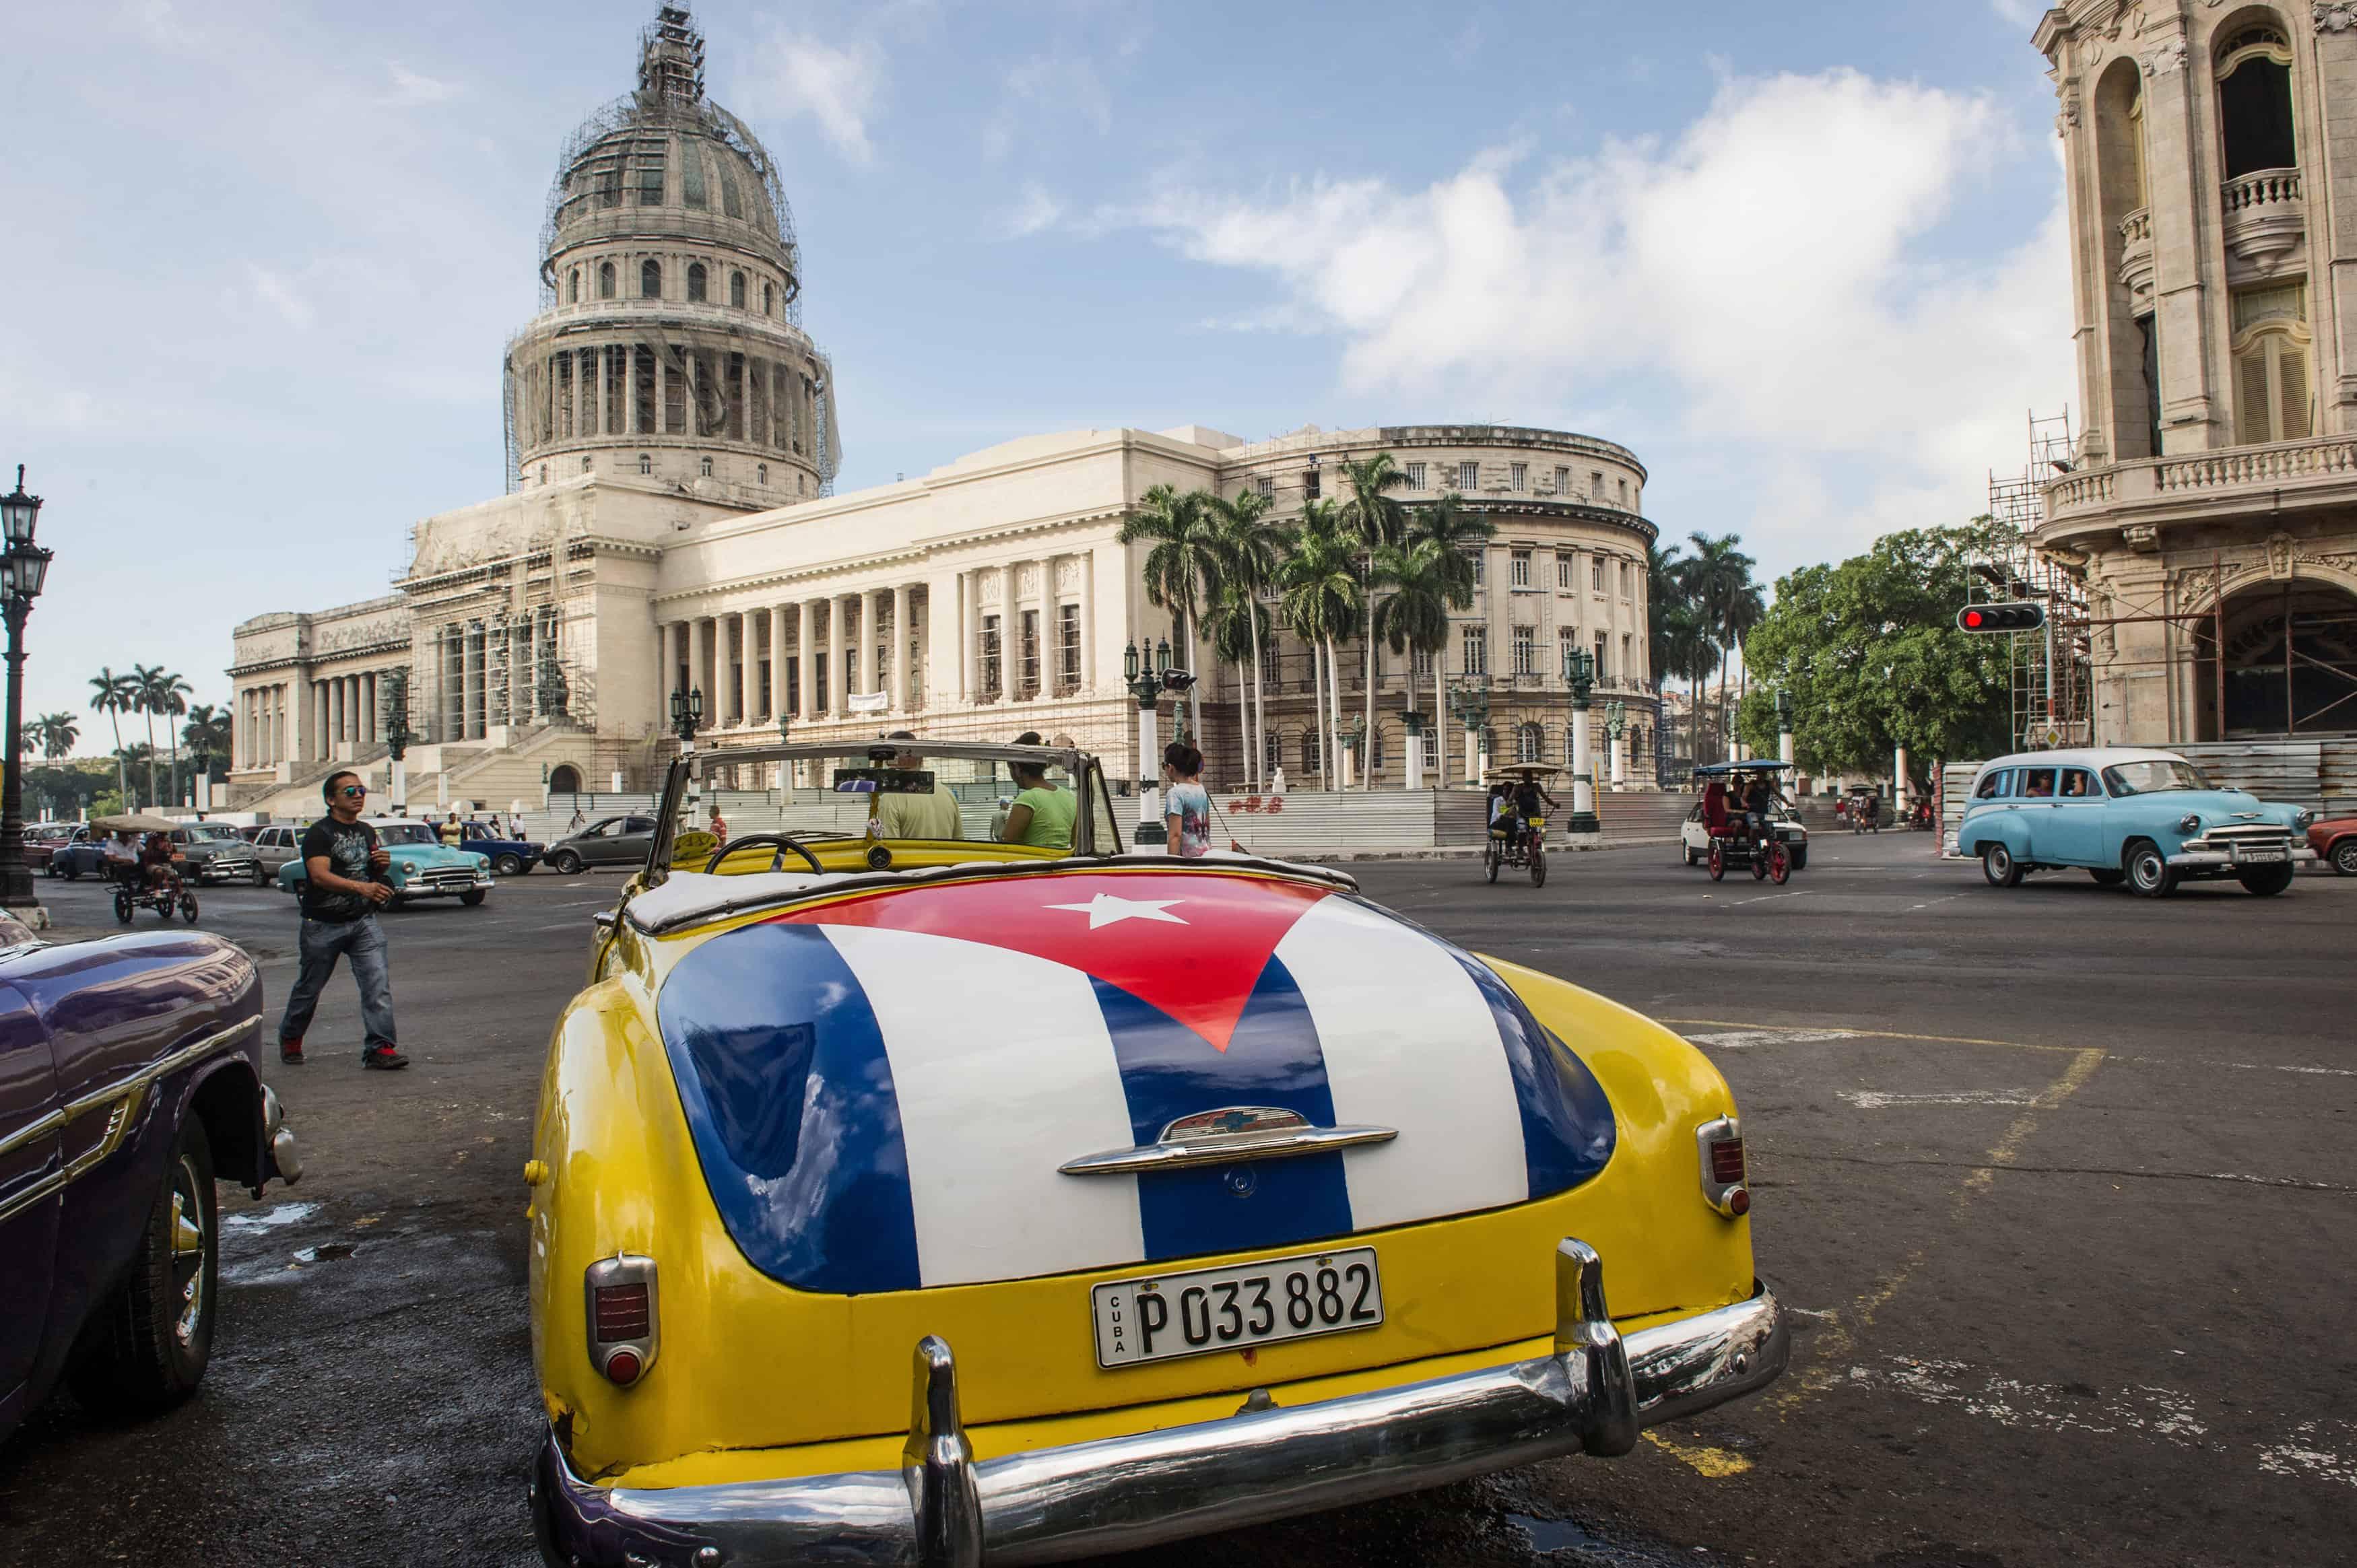 Havana S Goals In Us Cuba Normalization Remain Unclear